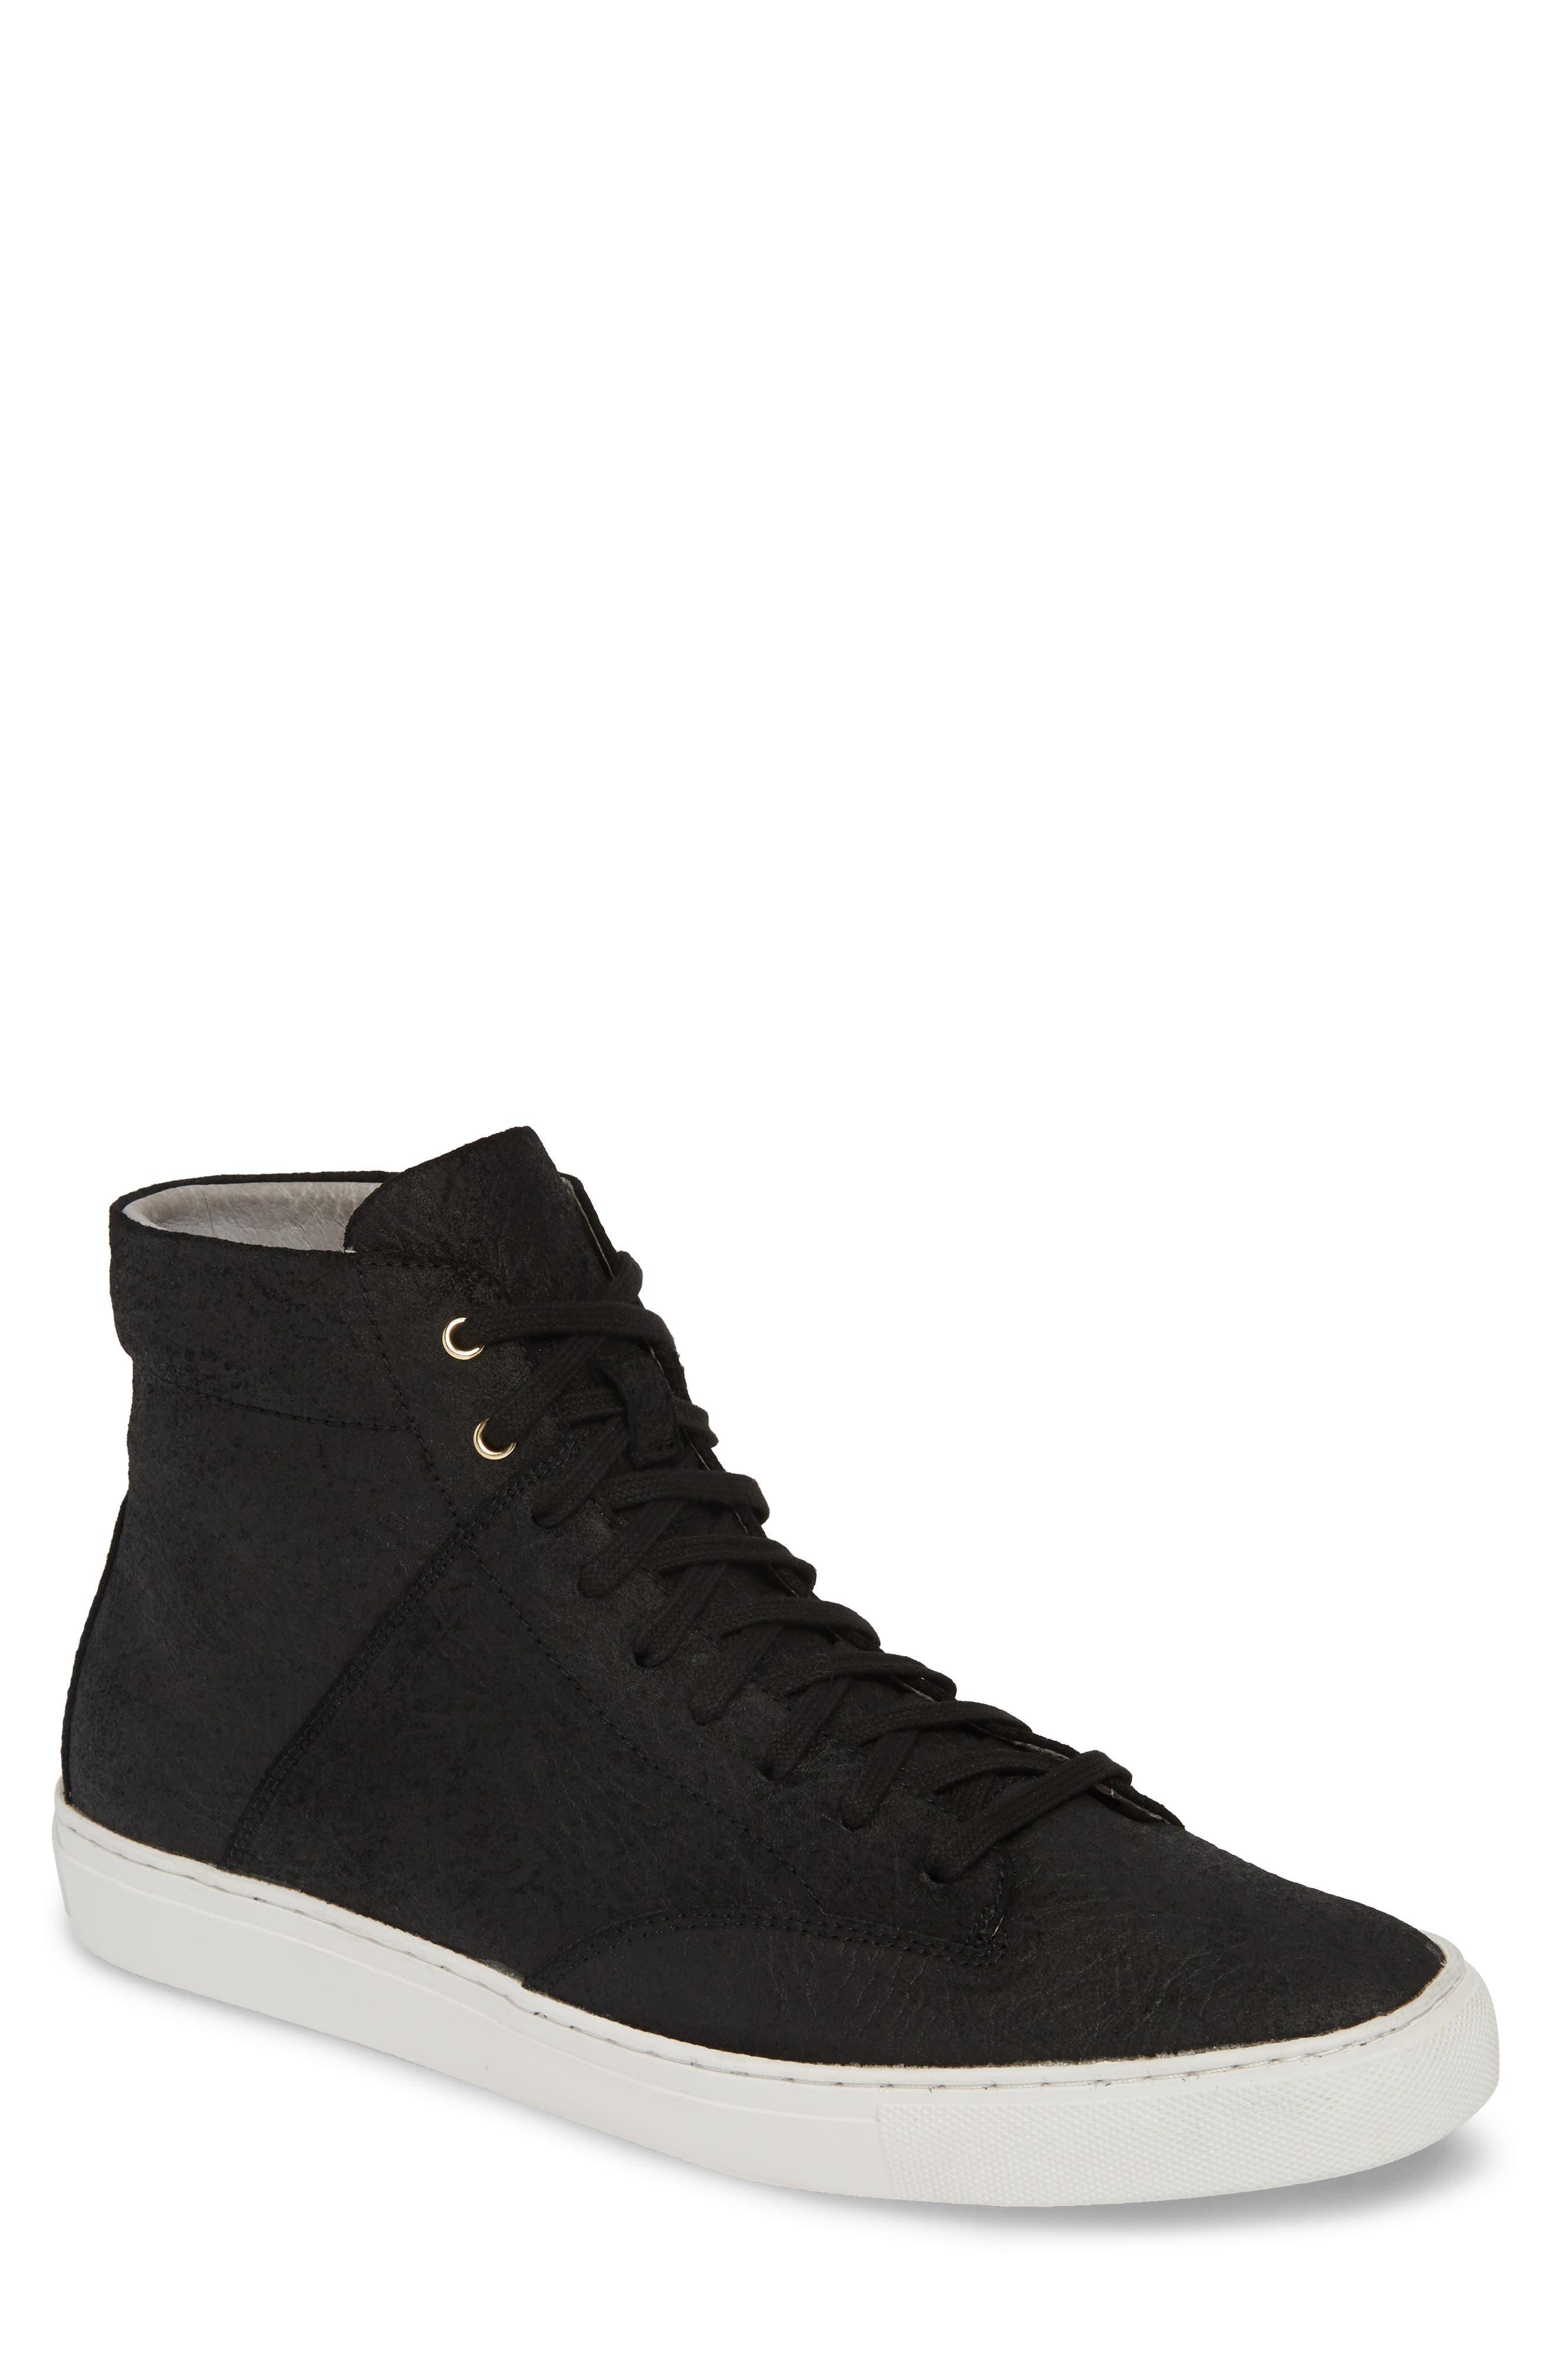 TCG, 'Porter' High Top Sneaker, Main thumbnail 1, color, BLACK LEATHER